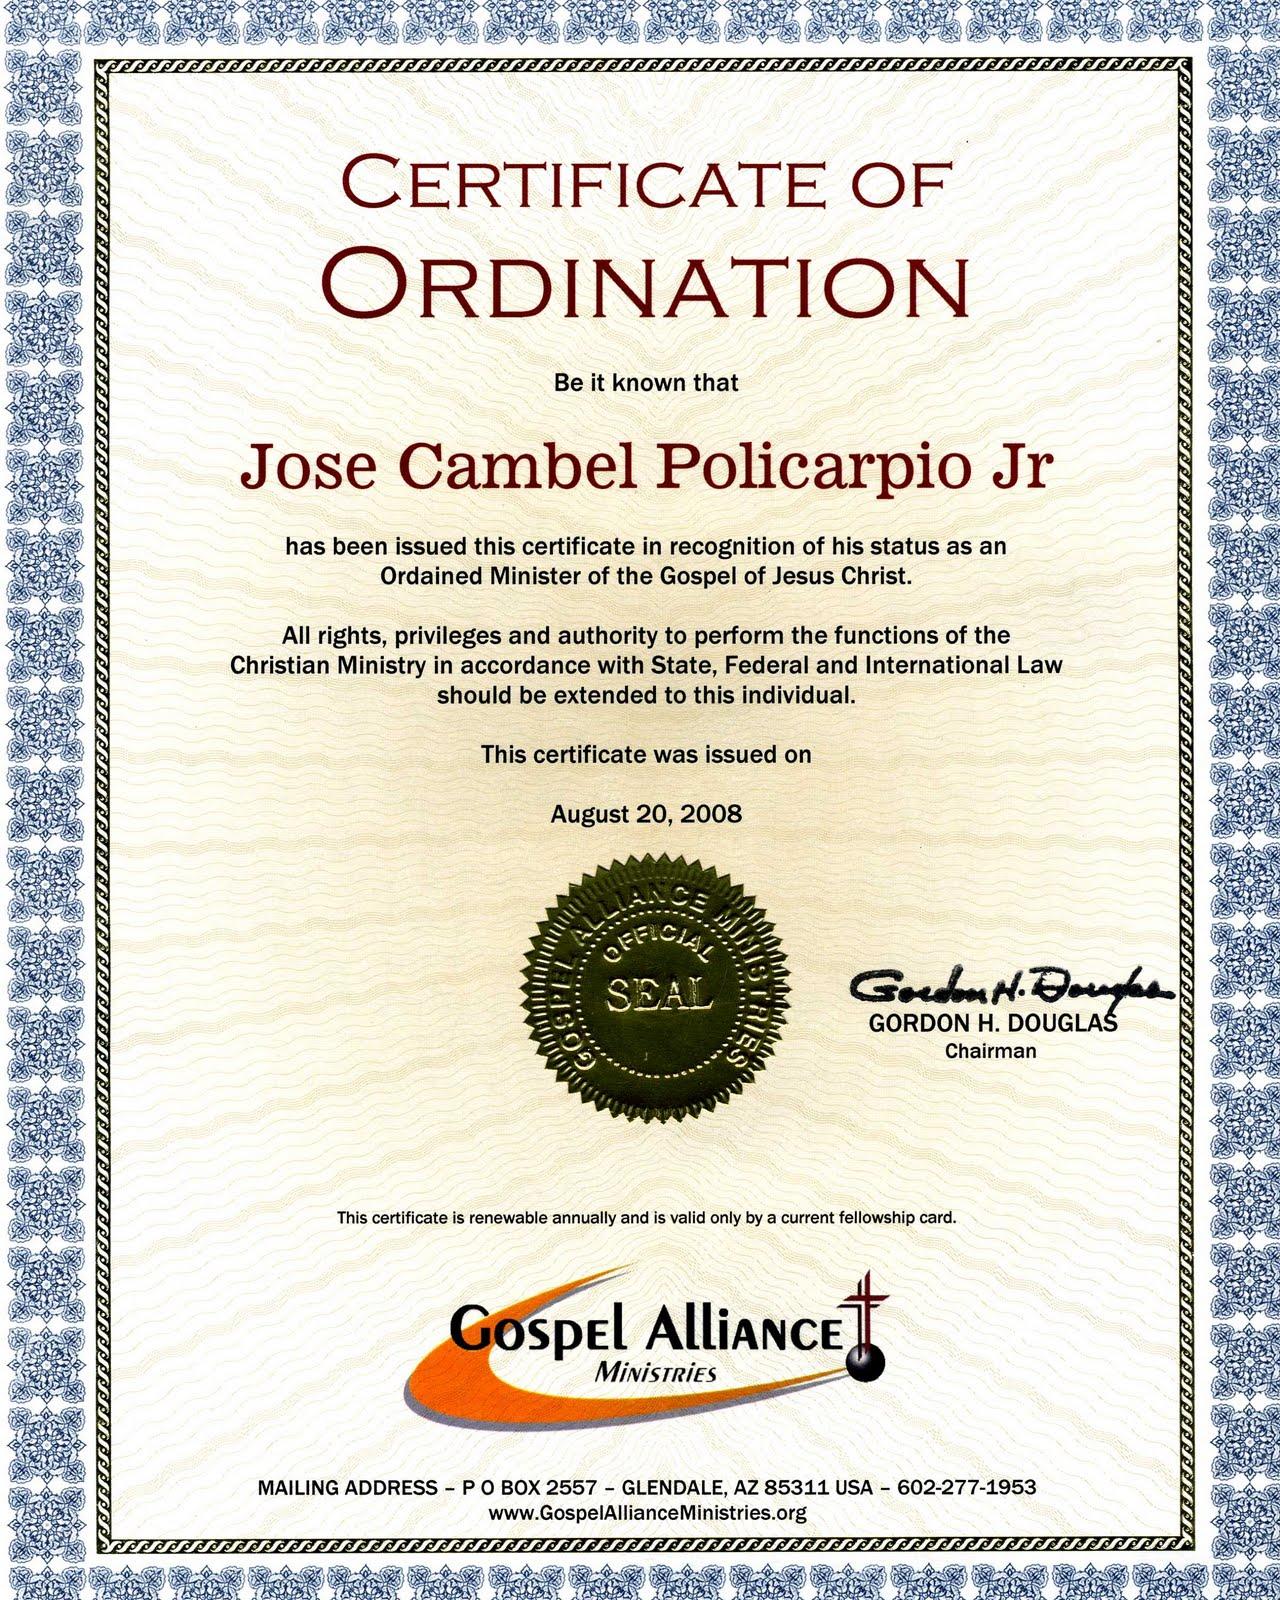 Cool certificate template pasoevolist cool certificate template 1betcityfo Gallery